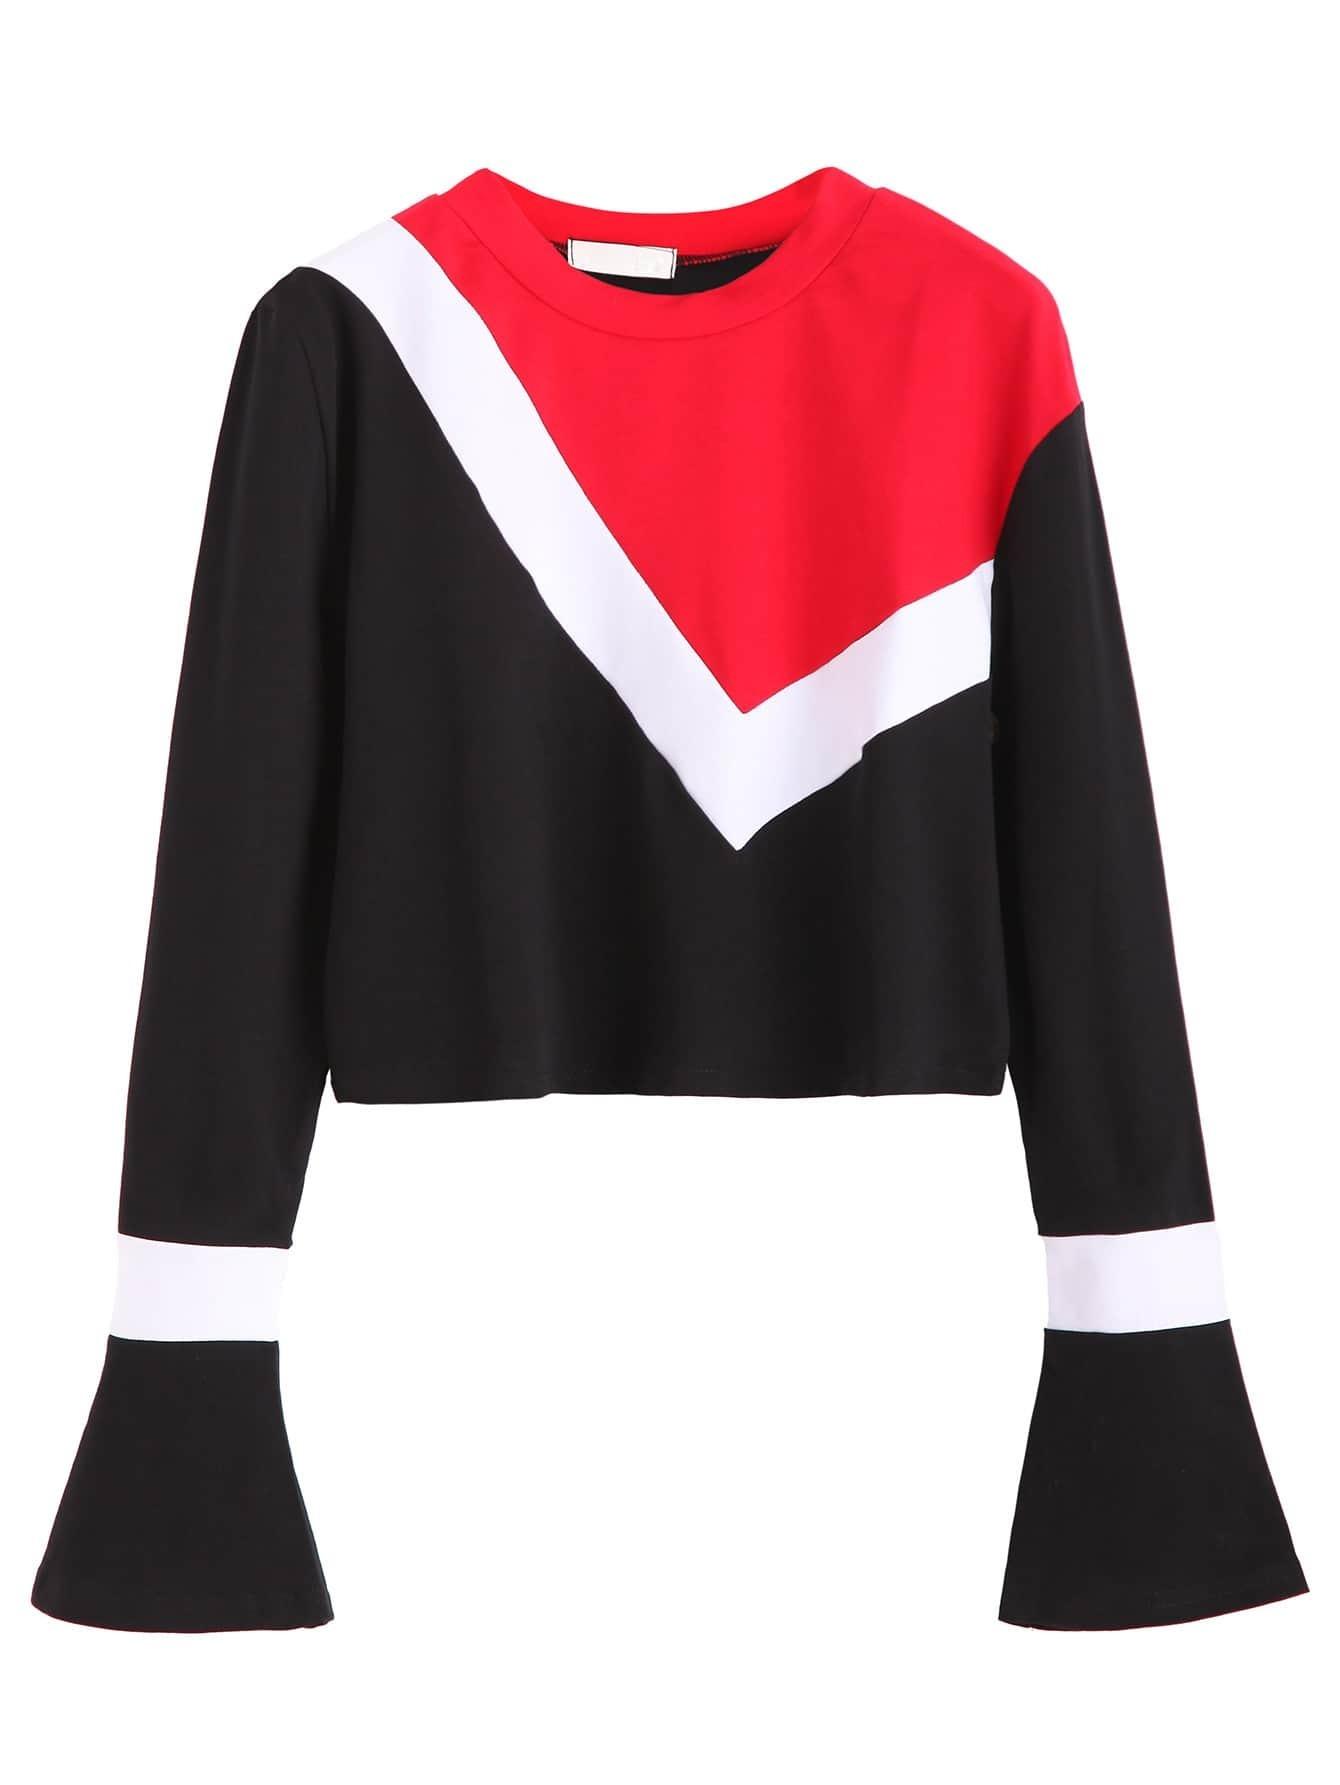 Color Block Bell Sleeve Crop T Shirtfor Women Romwe